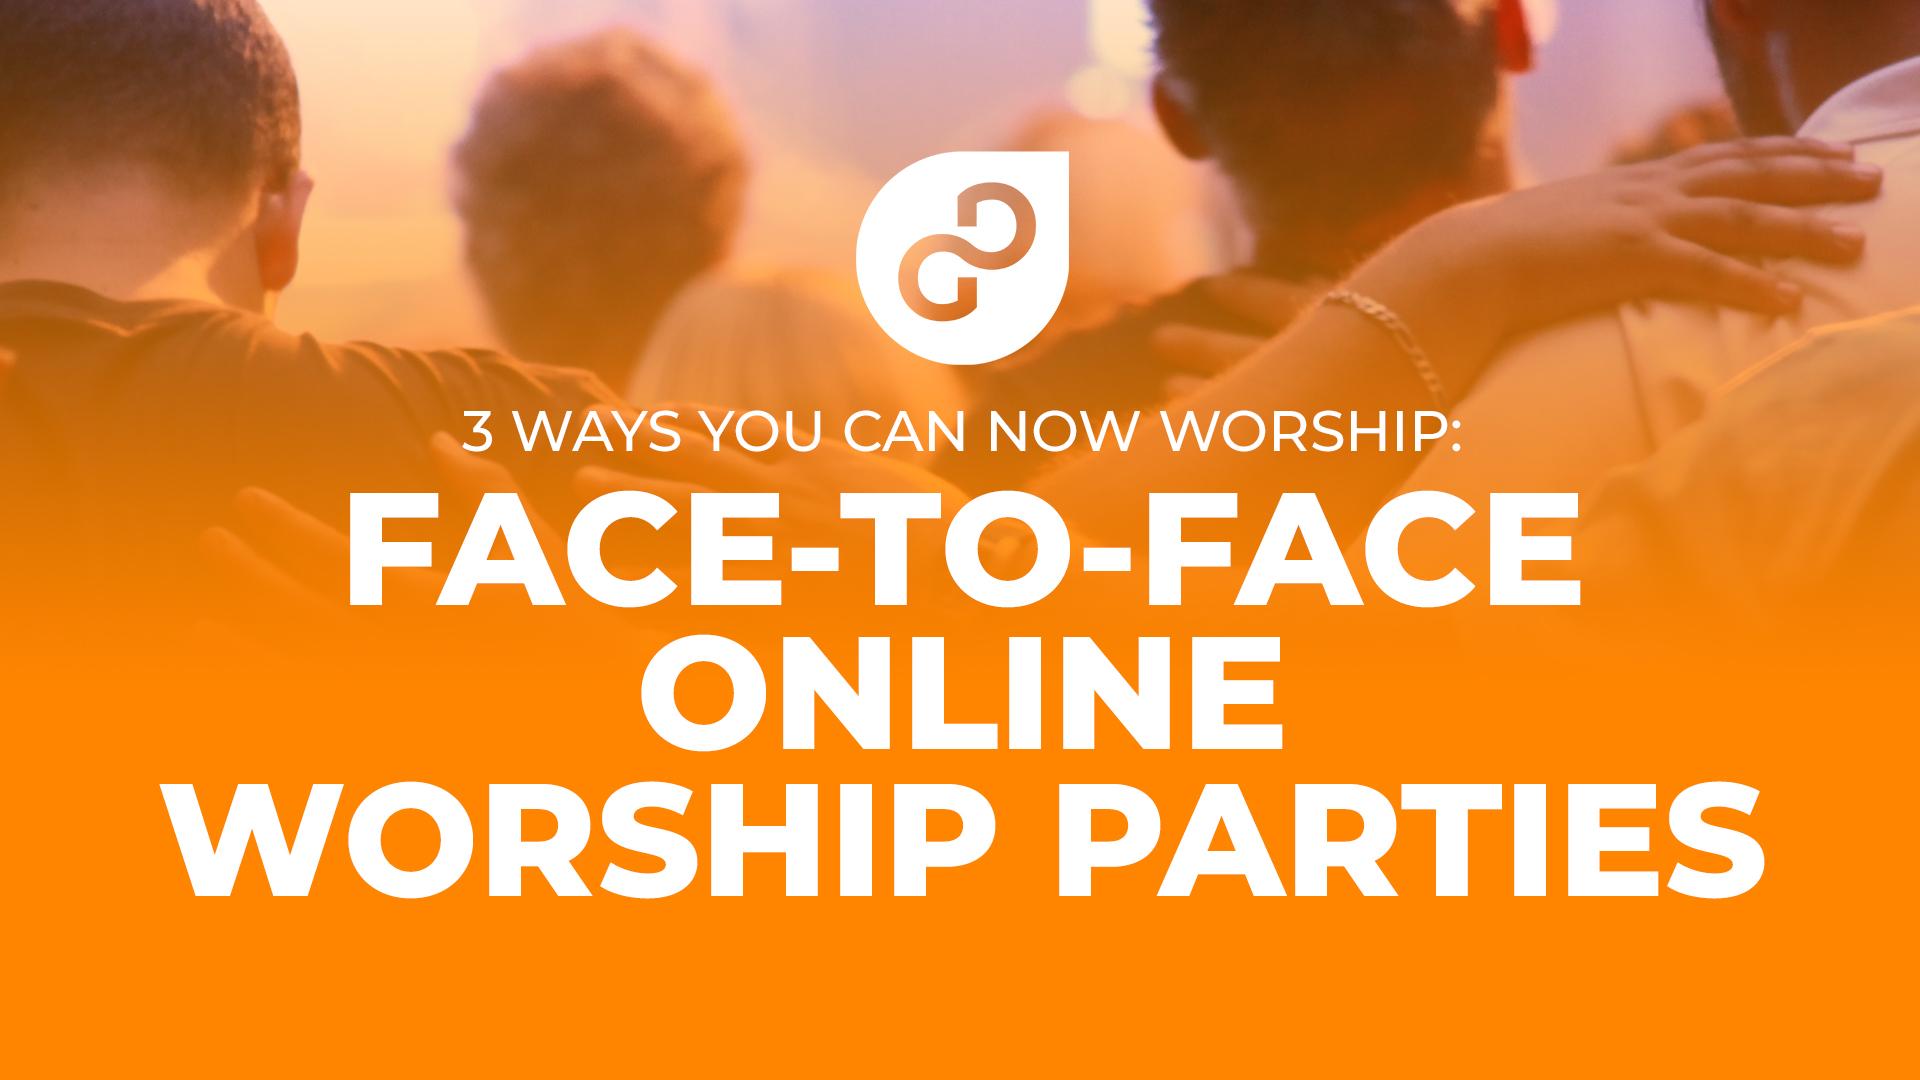 worship online, face to face, worship parties, gulf gate church, sarasota Florida